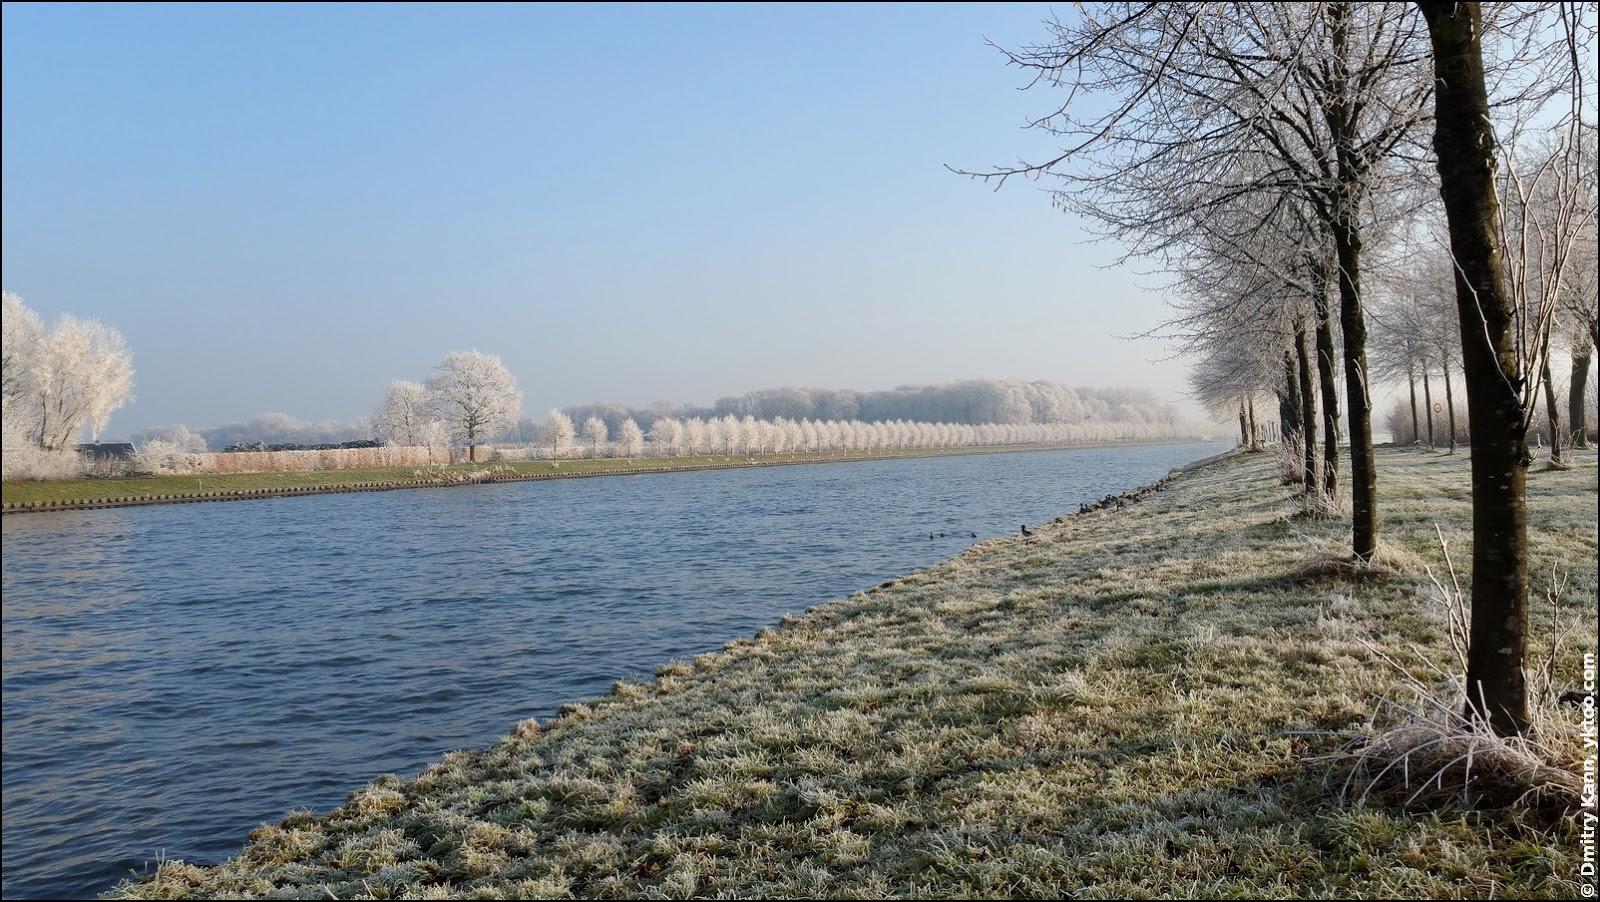 Amsterdam-Rijnkanaal.